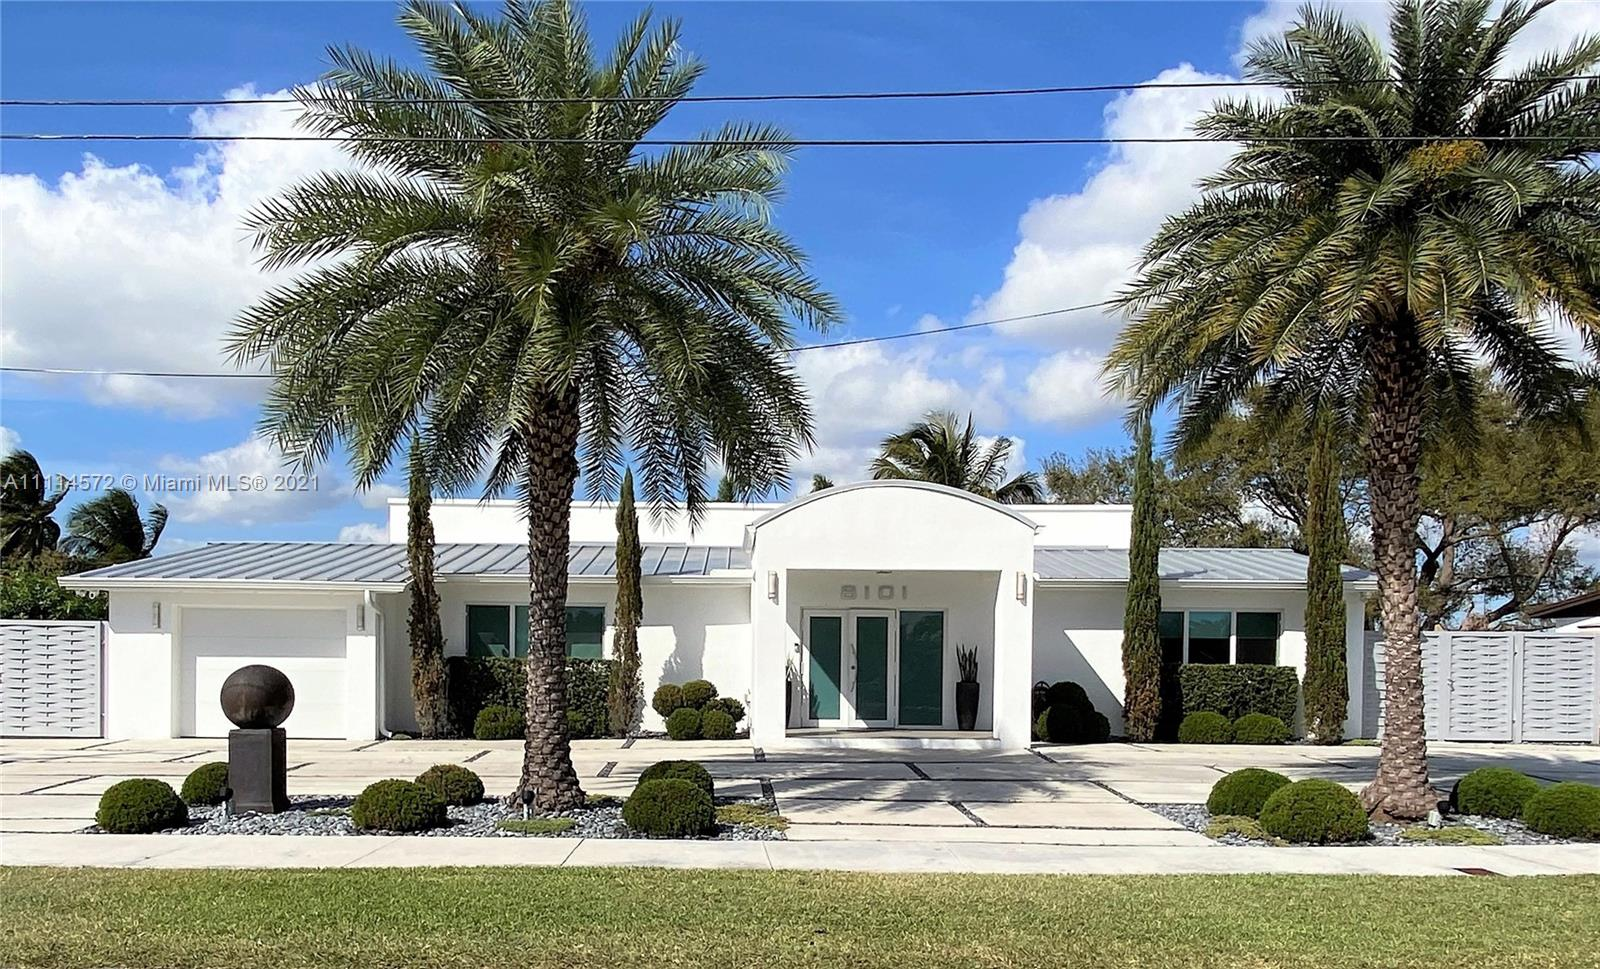 Palm Springs North - 8101 NW 181st St, Hialeah, FL 33015